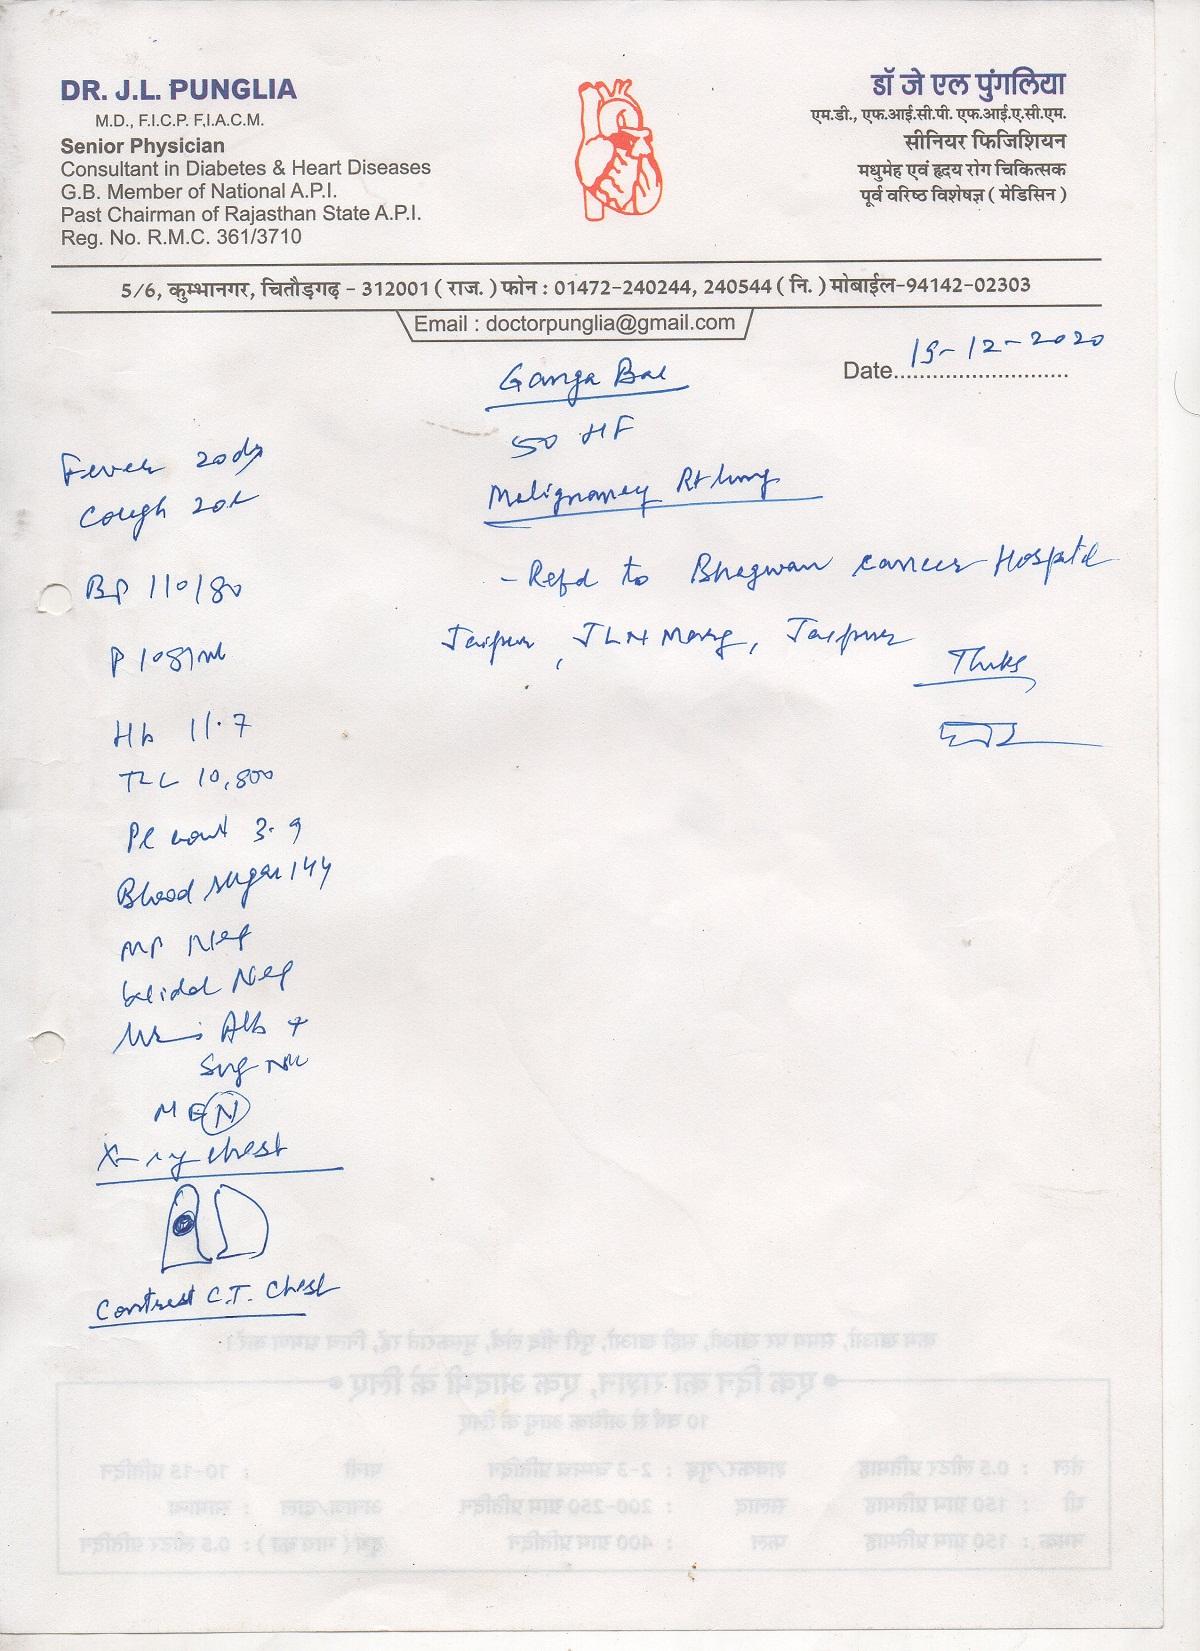 Ganga-bai-cancer-Treatment-1